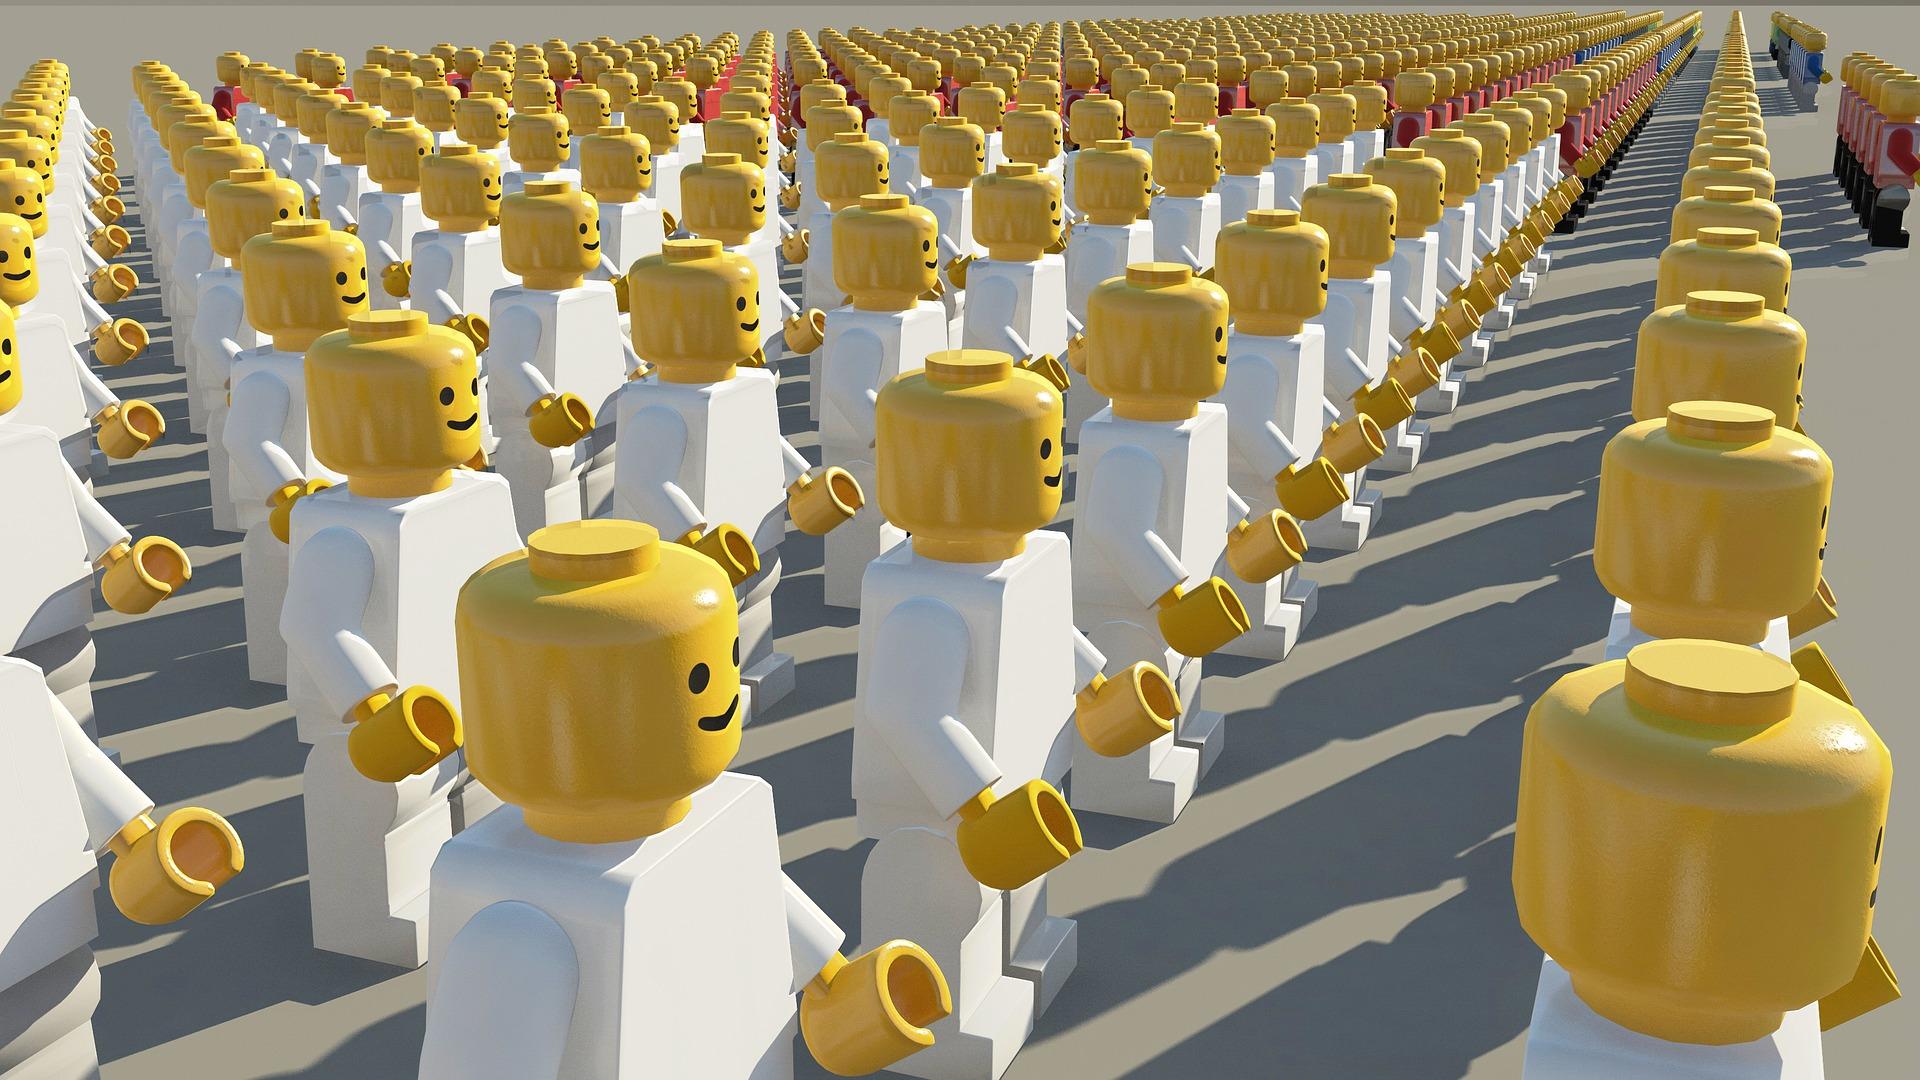 Ukraїnśki peršoklasnyky bezkoštovno otrymajuť nabory LEGO